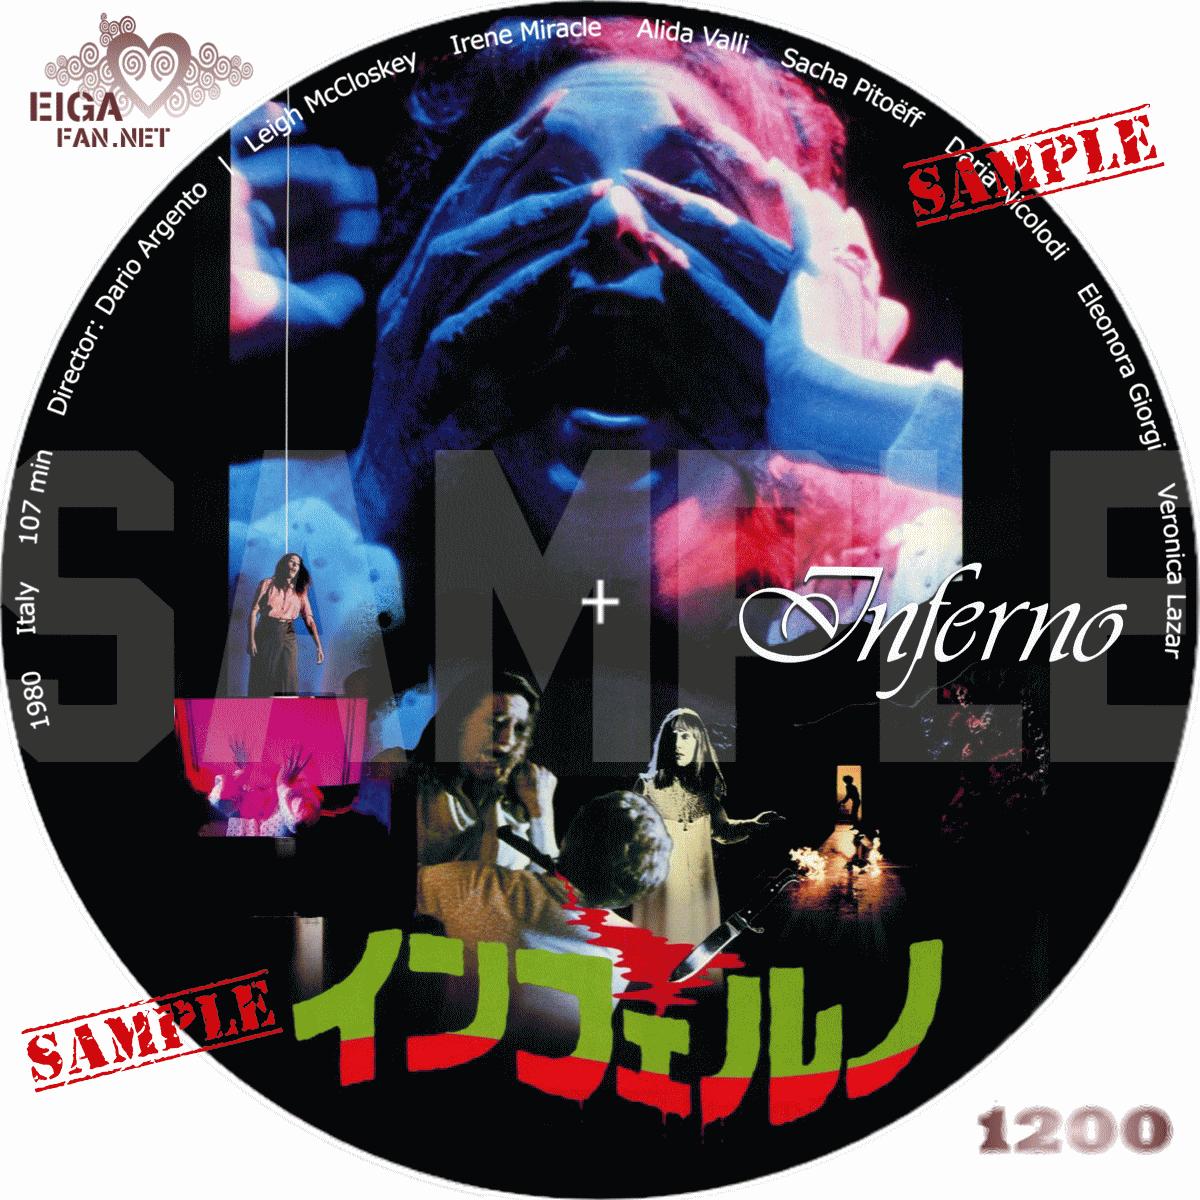 DVDラベル】インフェルノ/INFERNO (1980) ダリオ・アルジェント監督作